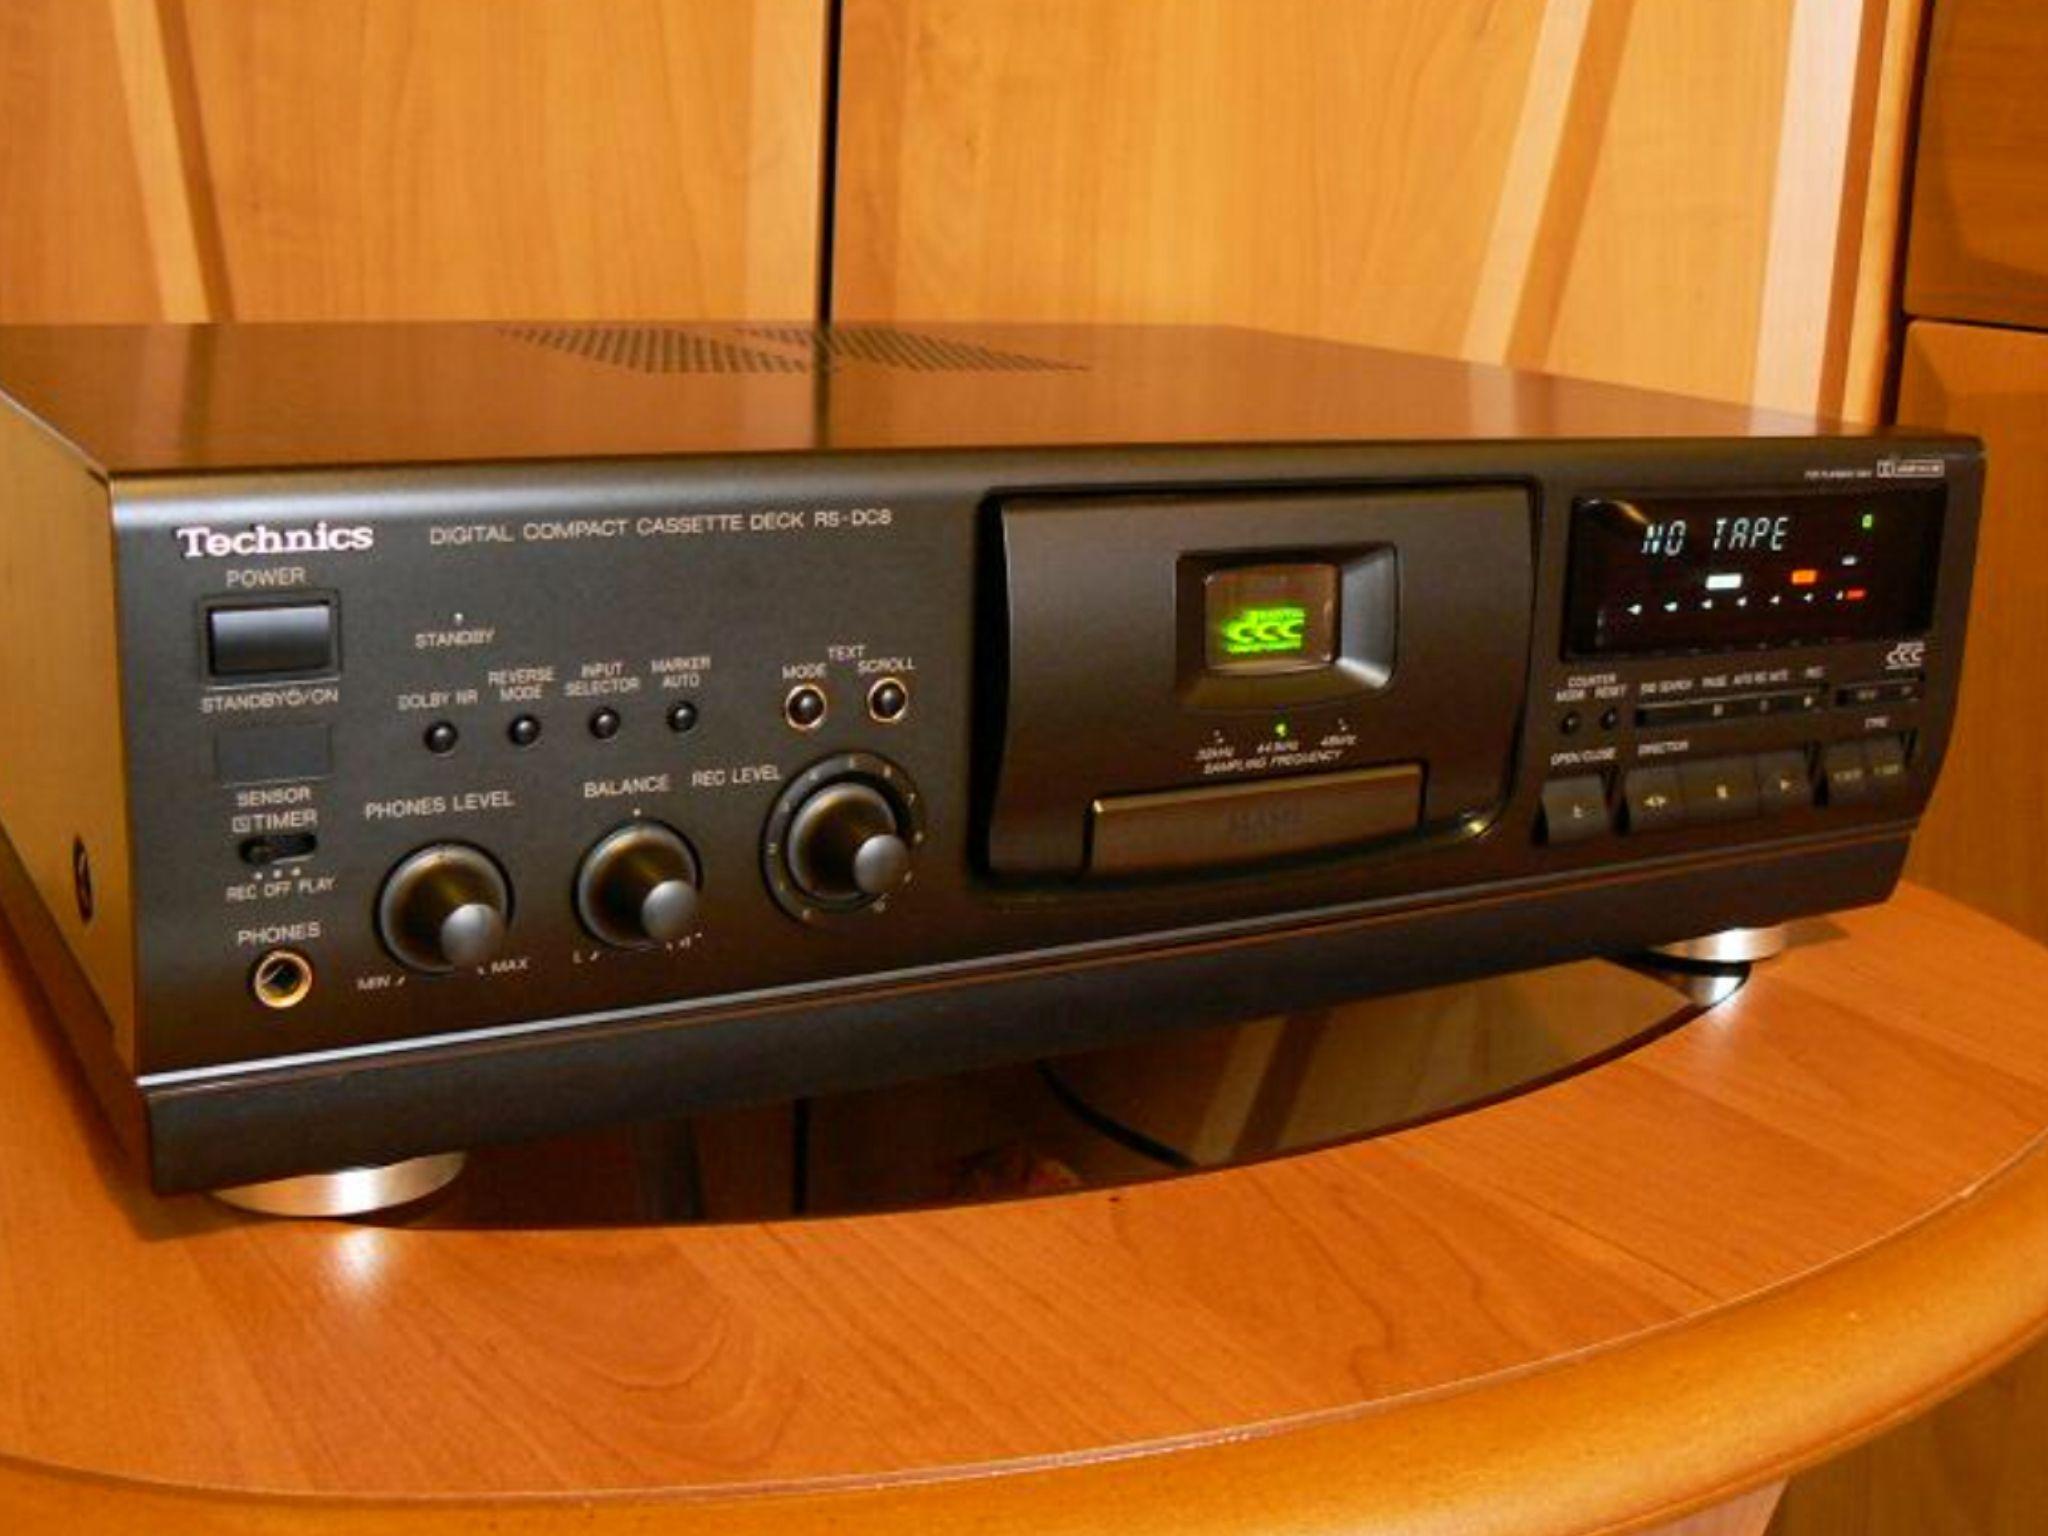 Technics Rs Dc8 Dcc Deck 16 Bit Pasc Stereo Audio Pinterest Amplifier Mono With Ic Tda7293 100 Watts Xtronic